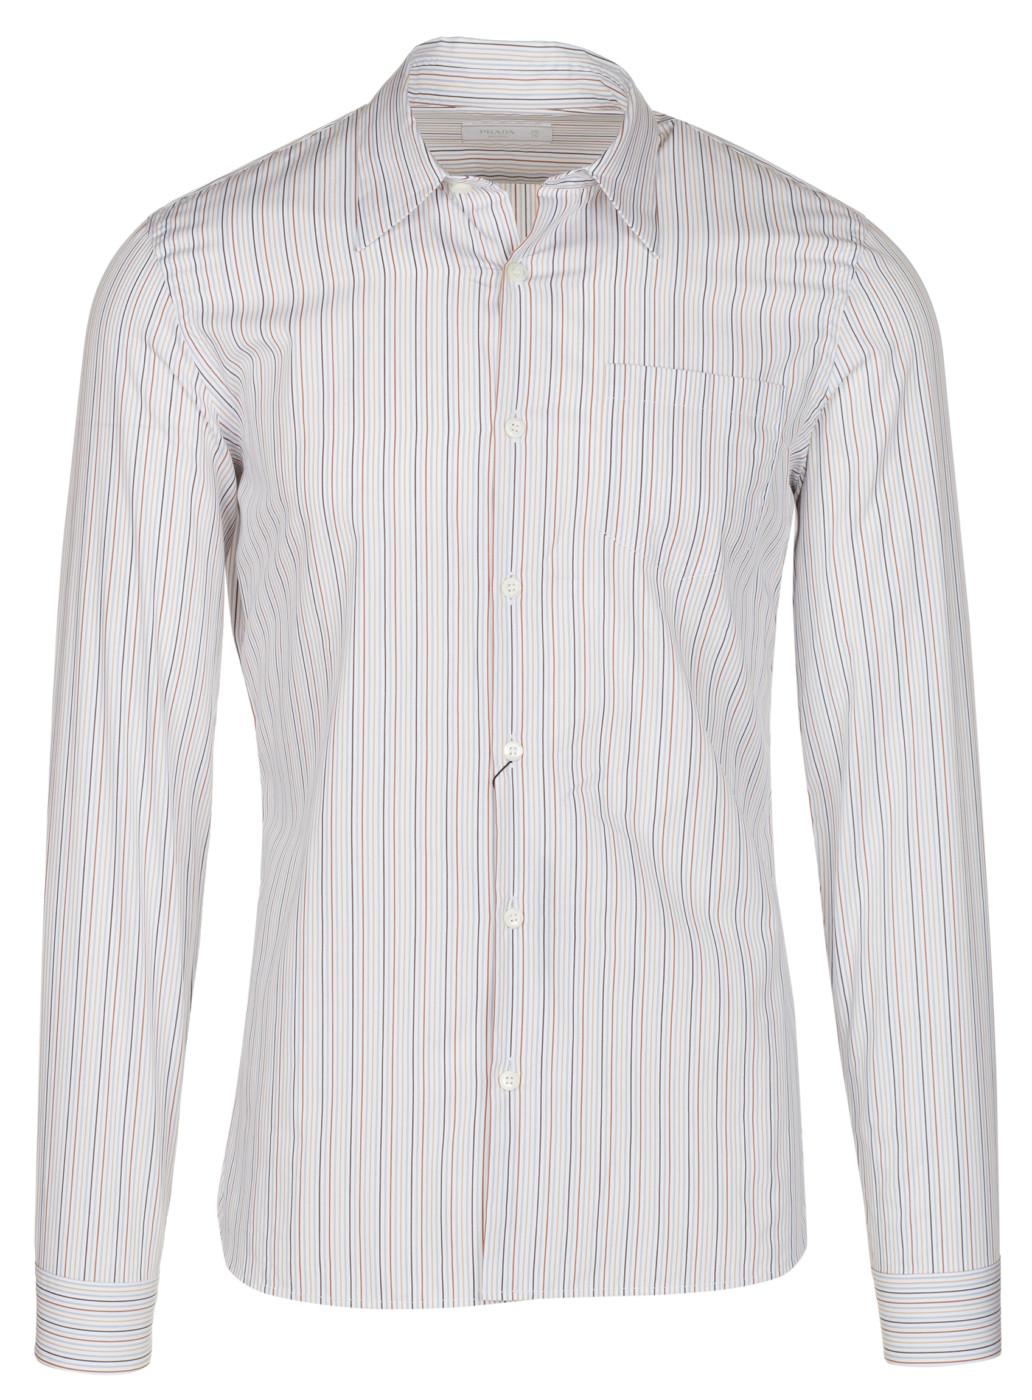 778bd04e9d3 Mens Black And White Striped Dress Shirt - DREAMWORKS